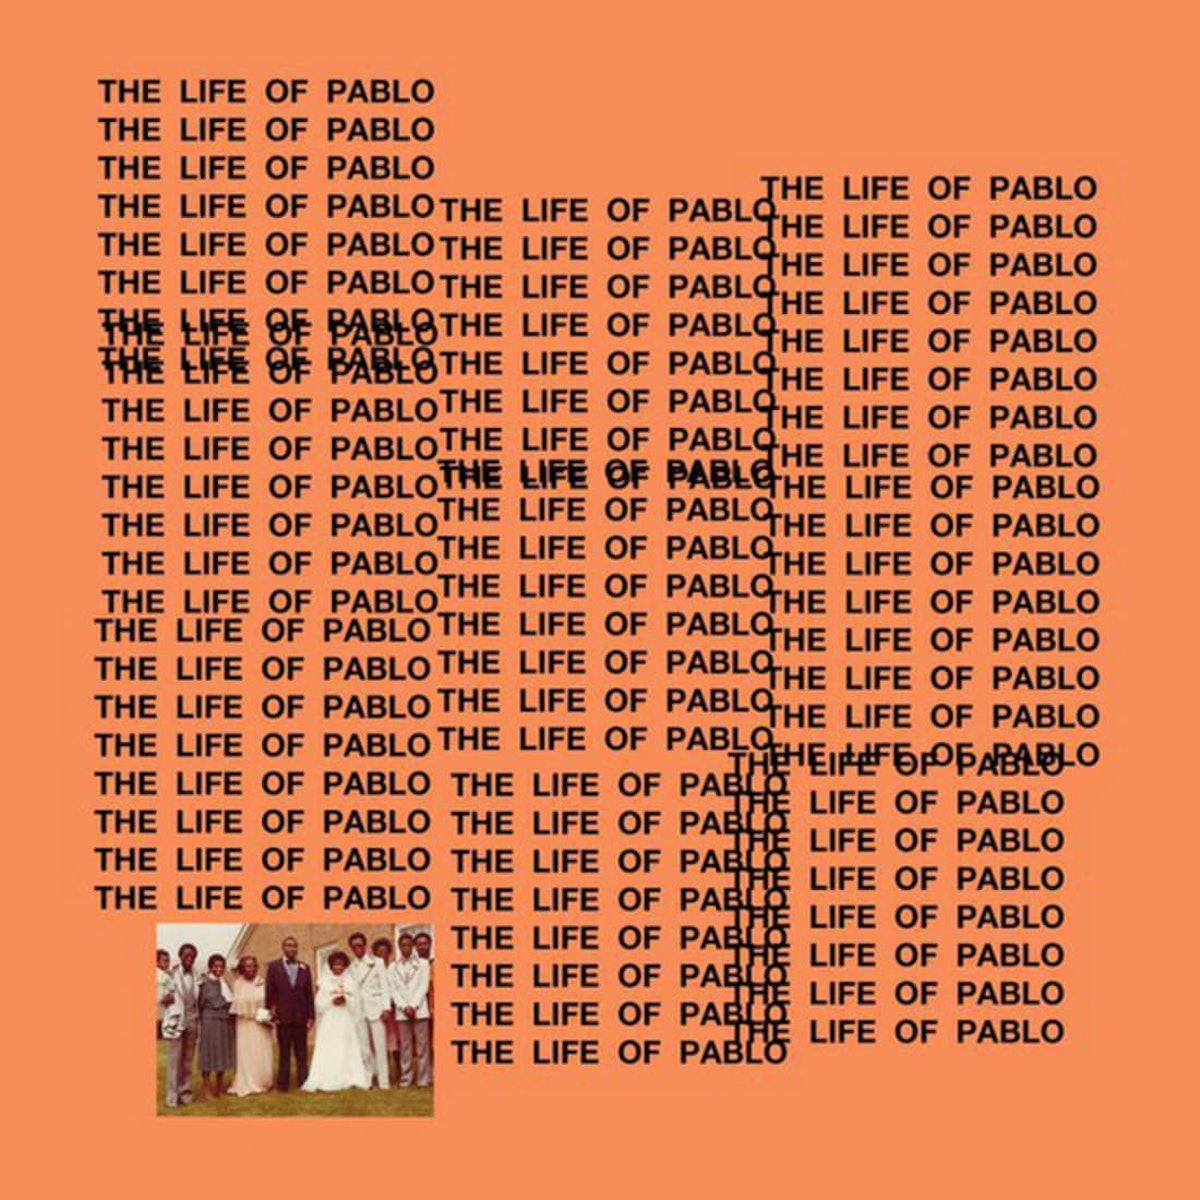 kanye-west-the-life-of-pablo-album-cover_olzhwf.jpg